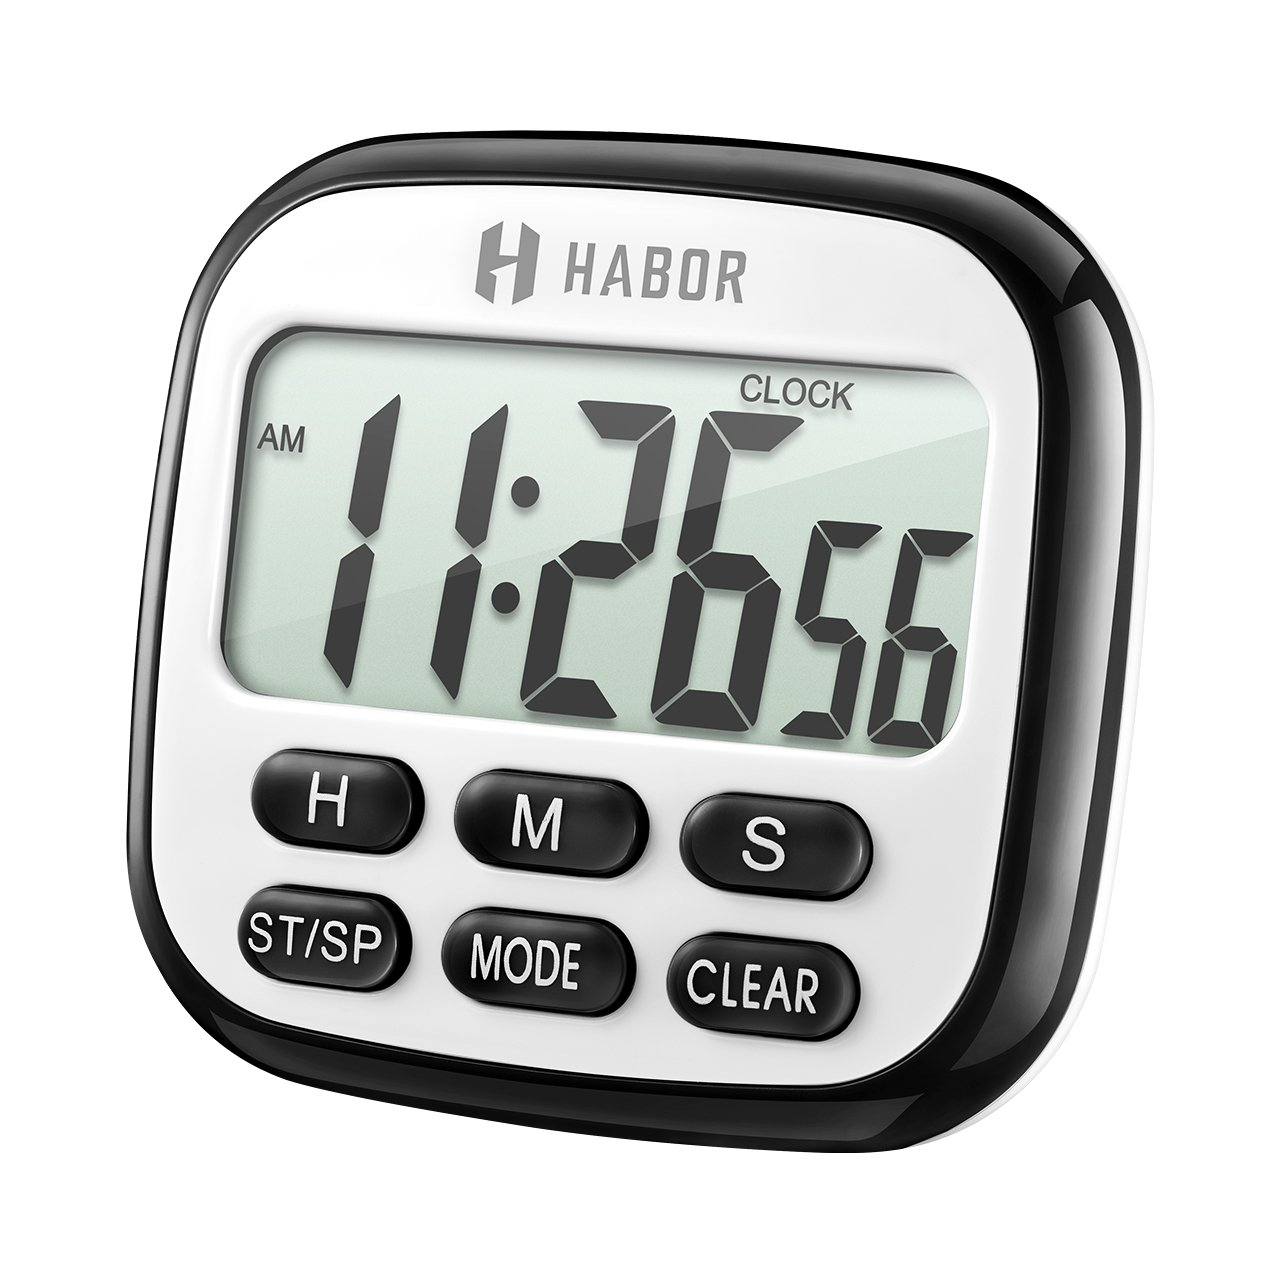 Habor Support – HABOR